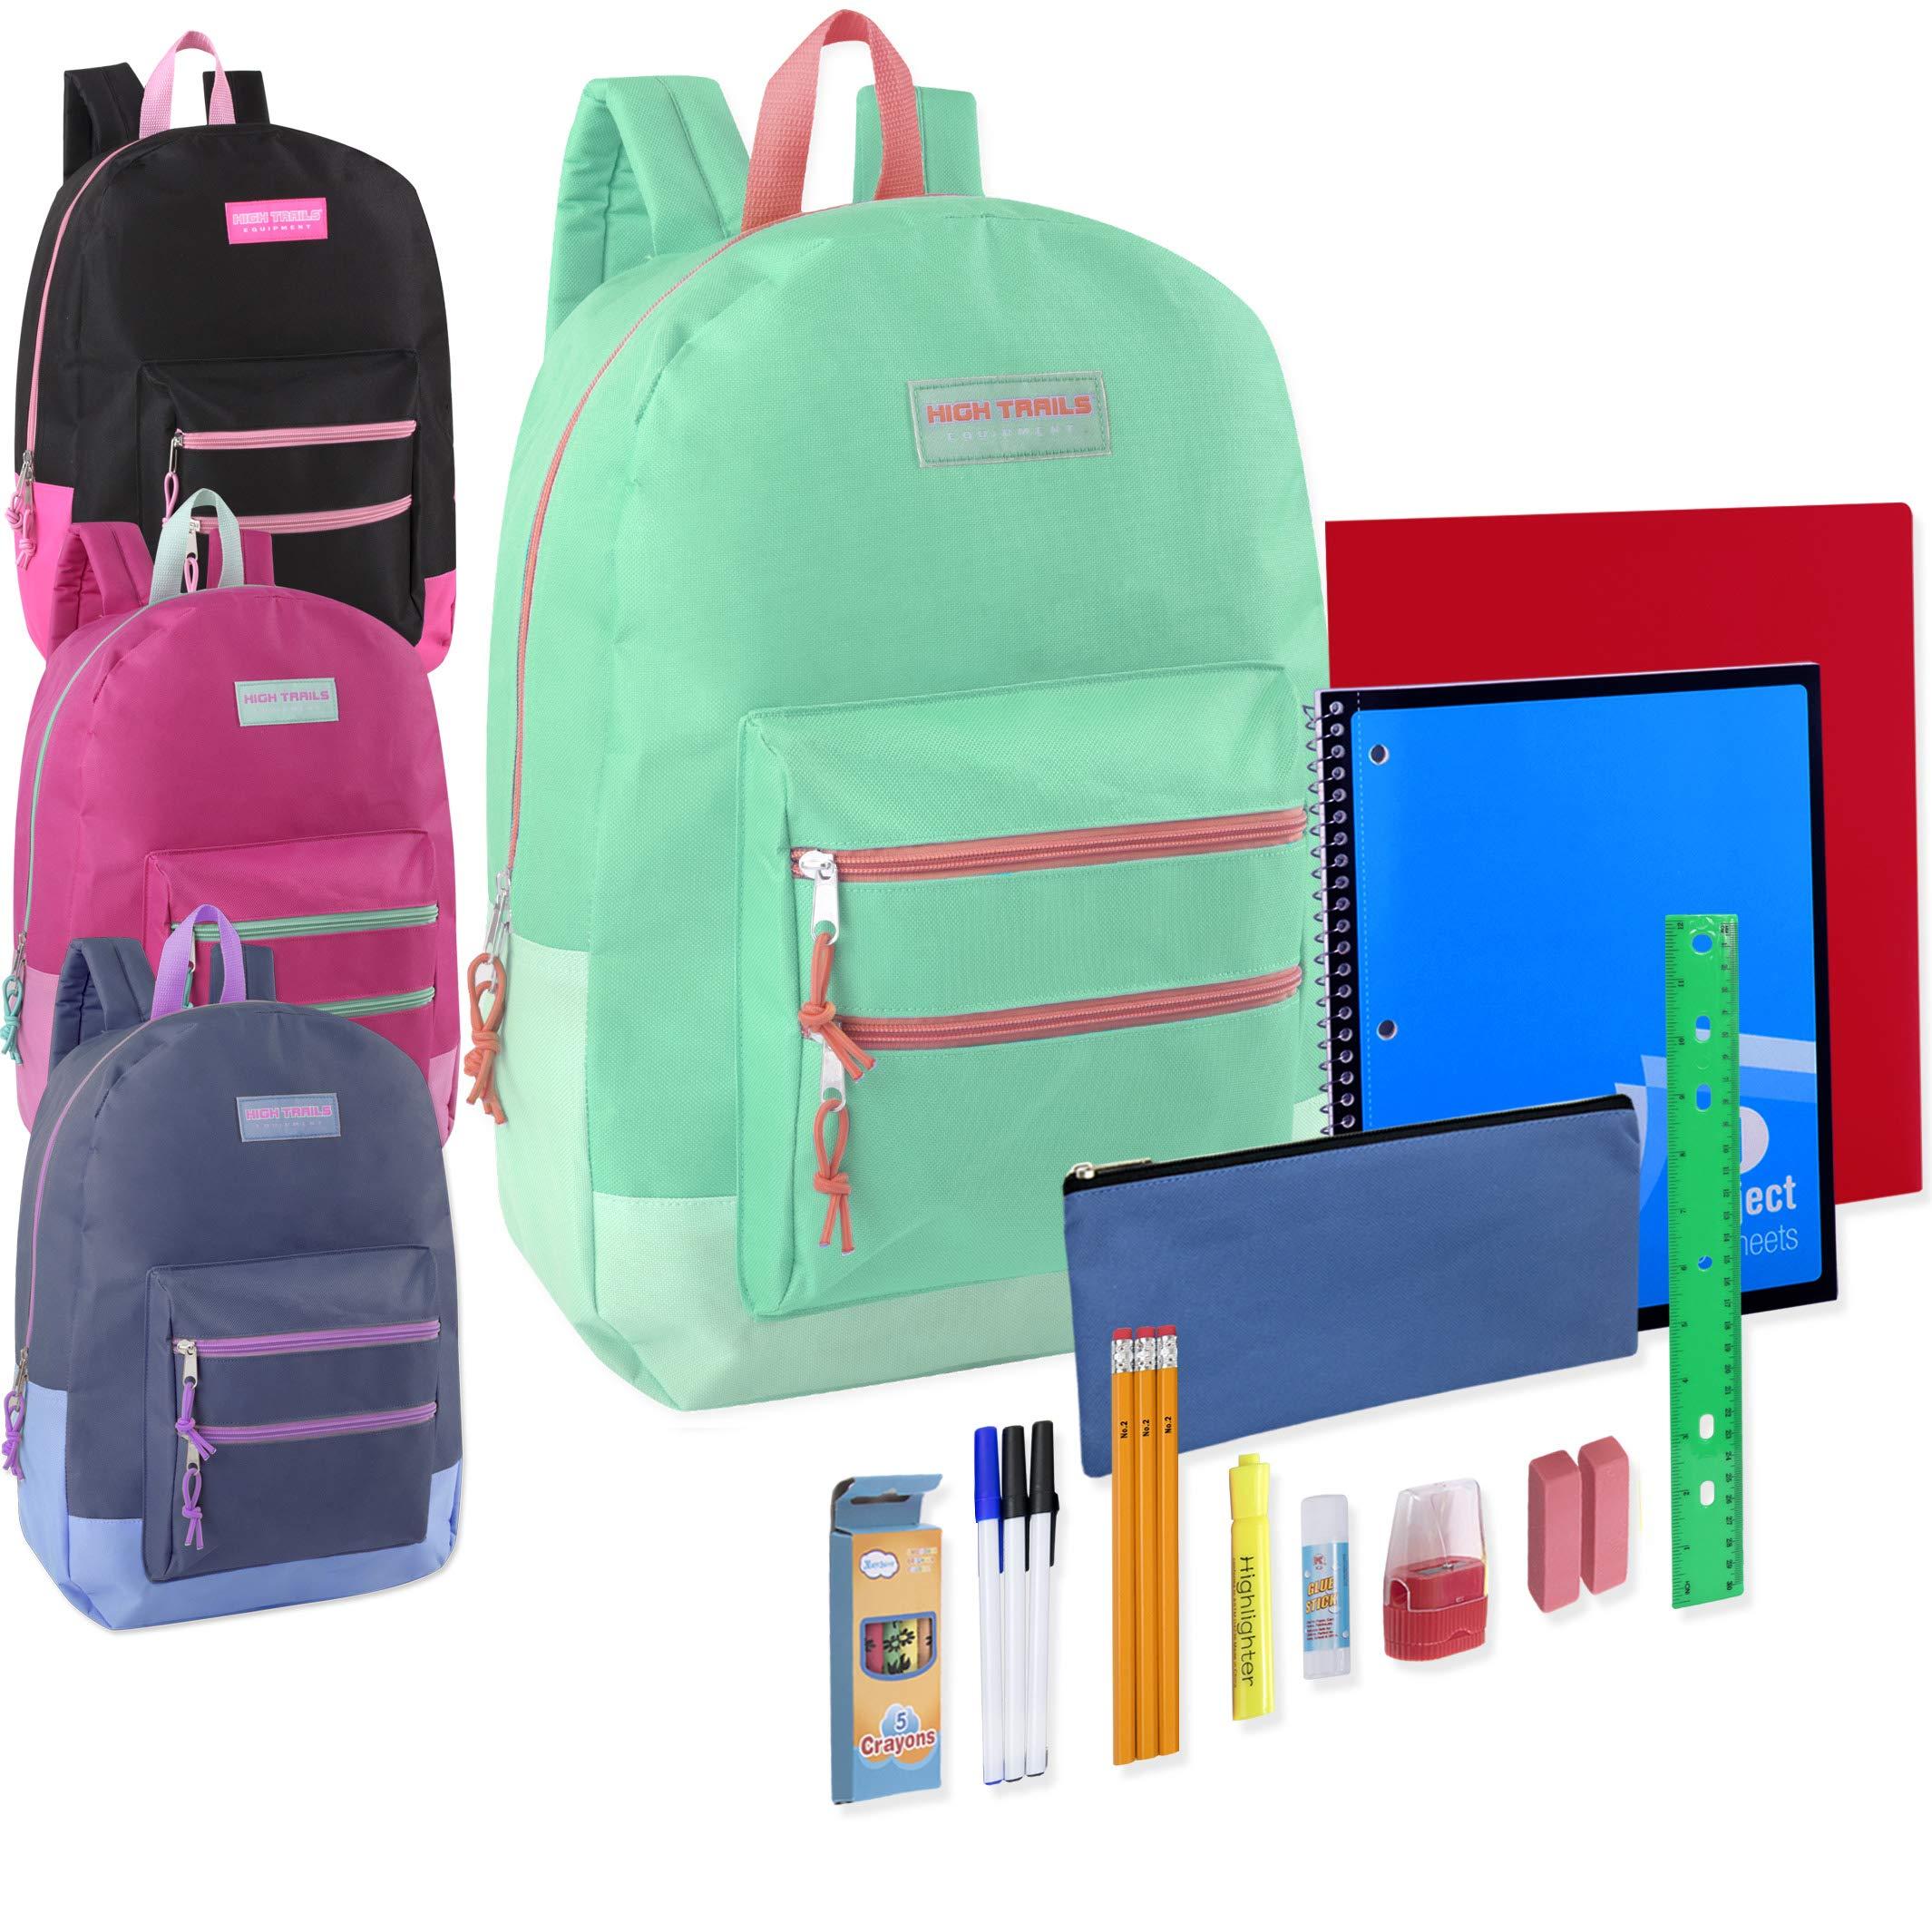 18 Inch Double Zip Backpacks & 20 Piece School Supply Kits in Bulk 12 Pack Bundles